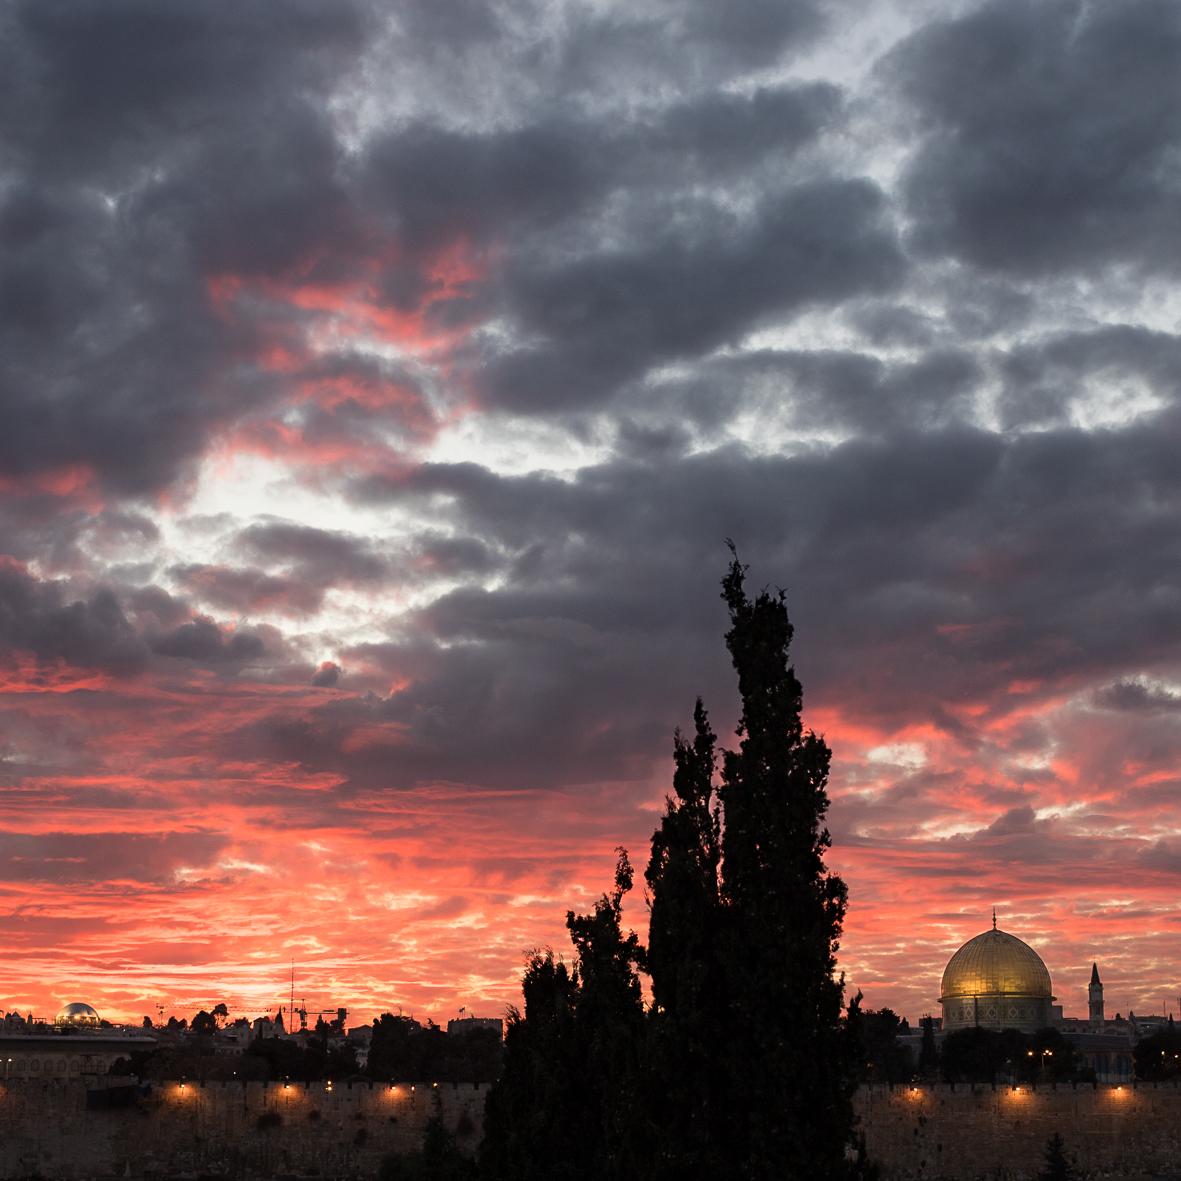 Sonnenuntergang am Tempelberg, Jerusalem